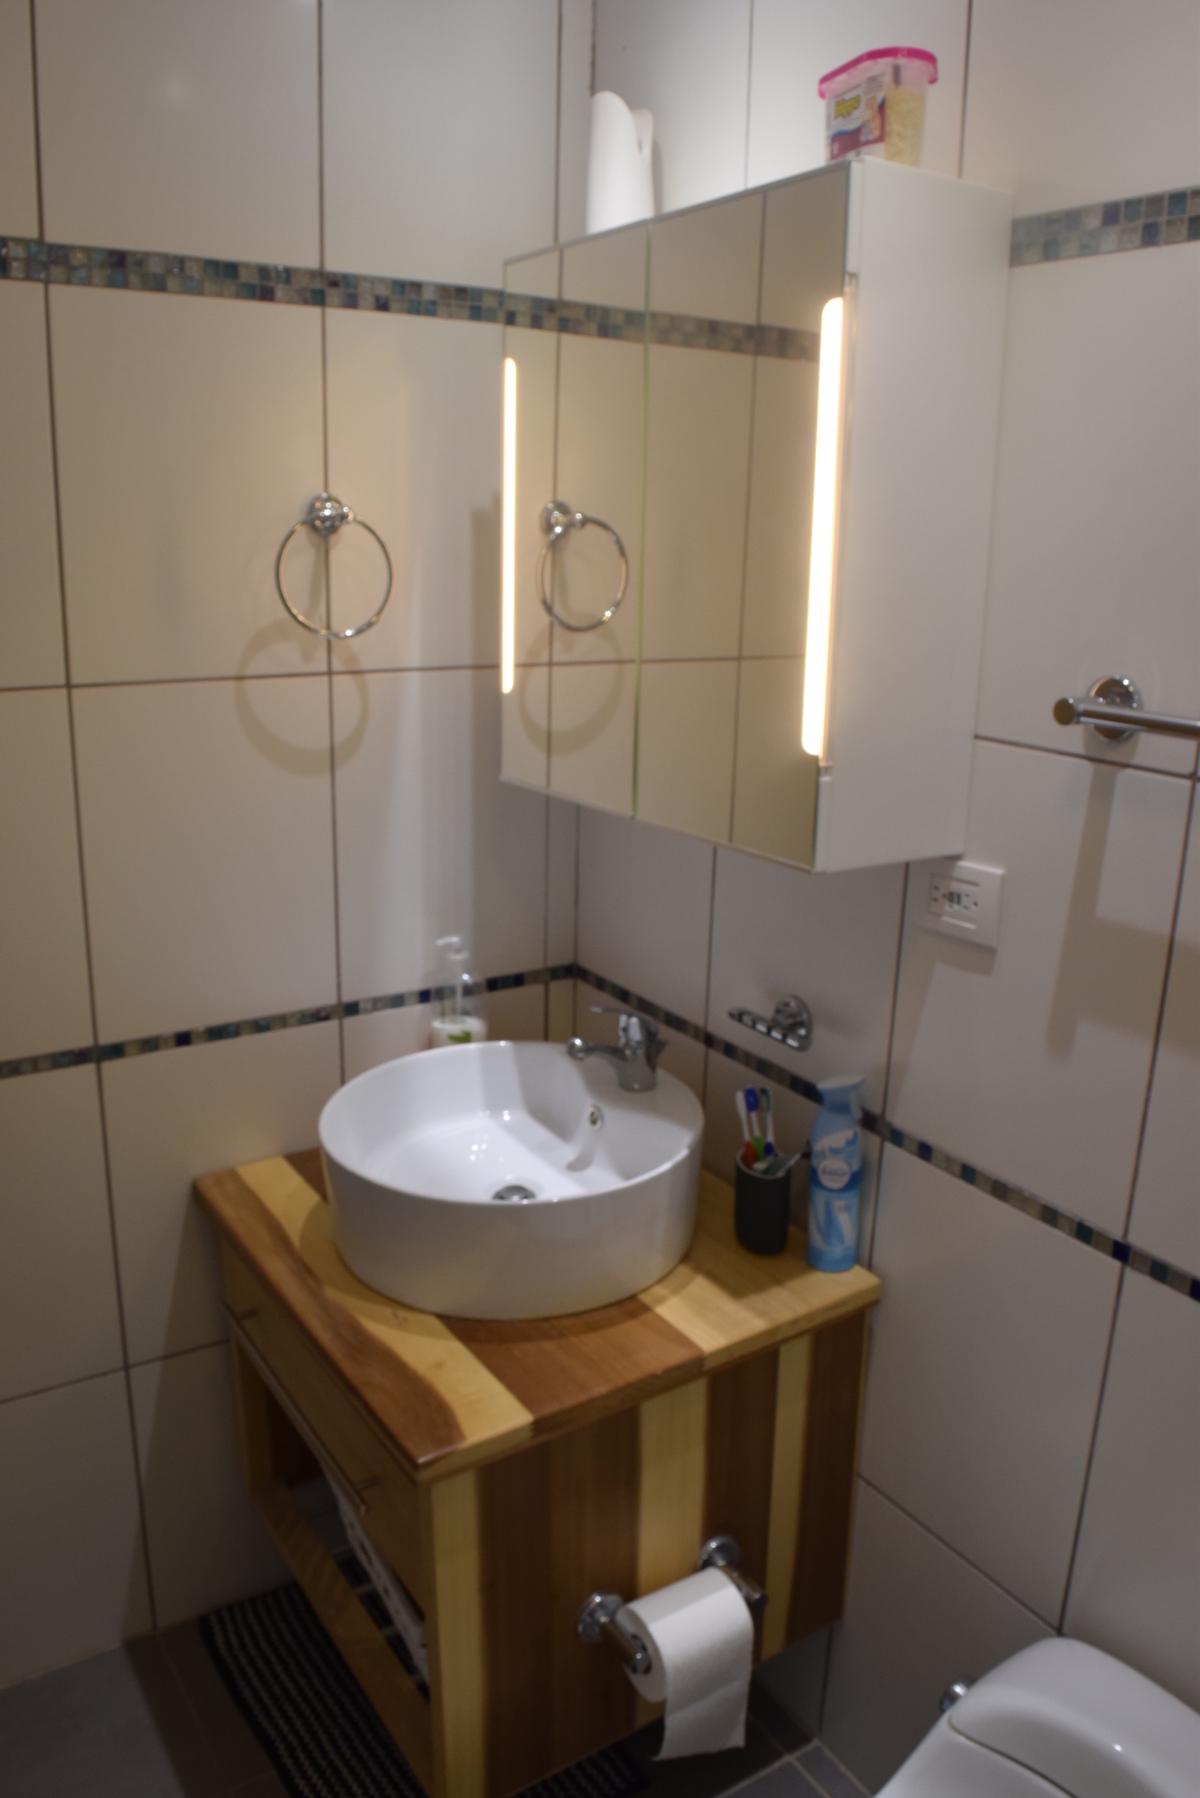 14 de 18: Detalle de lavamanos